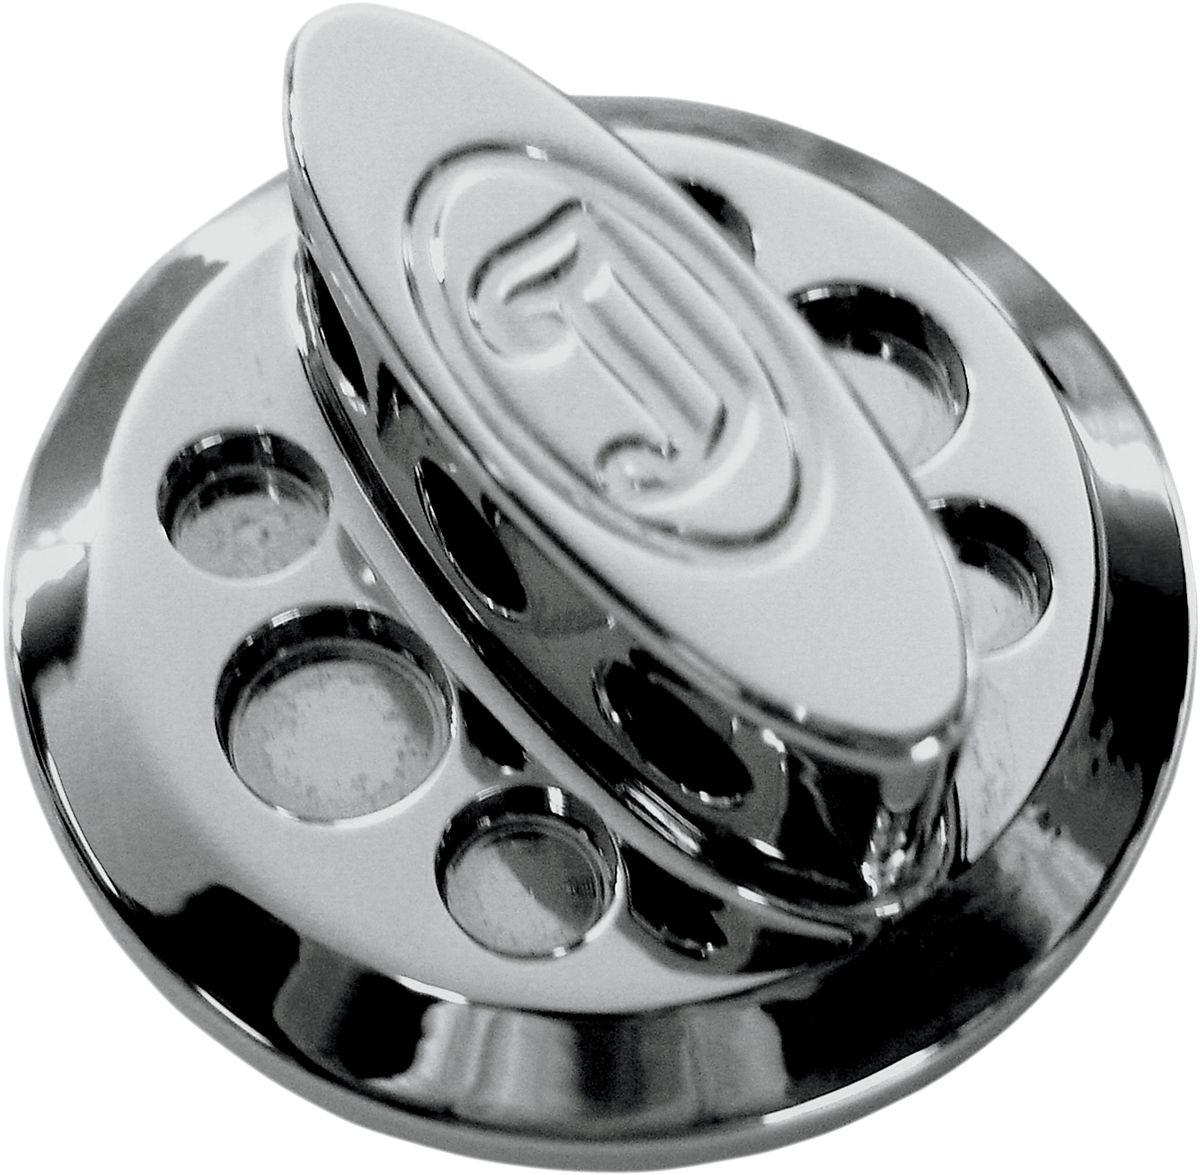 【JOKER MACHINE】機油加注口蓋 TRI 鍍鉻 【PLUG OIL TRI CHROME [0710-0096]】 - 「Webike-摩托百貨」